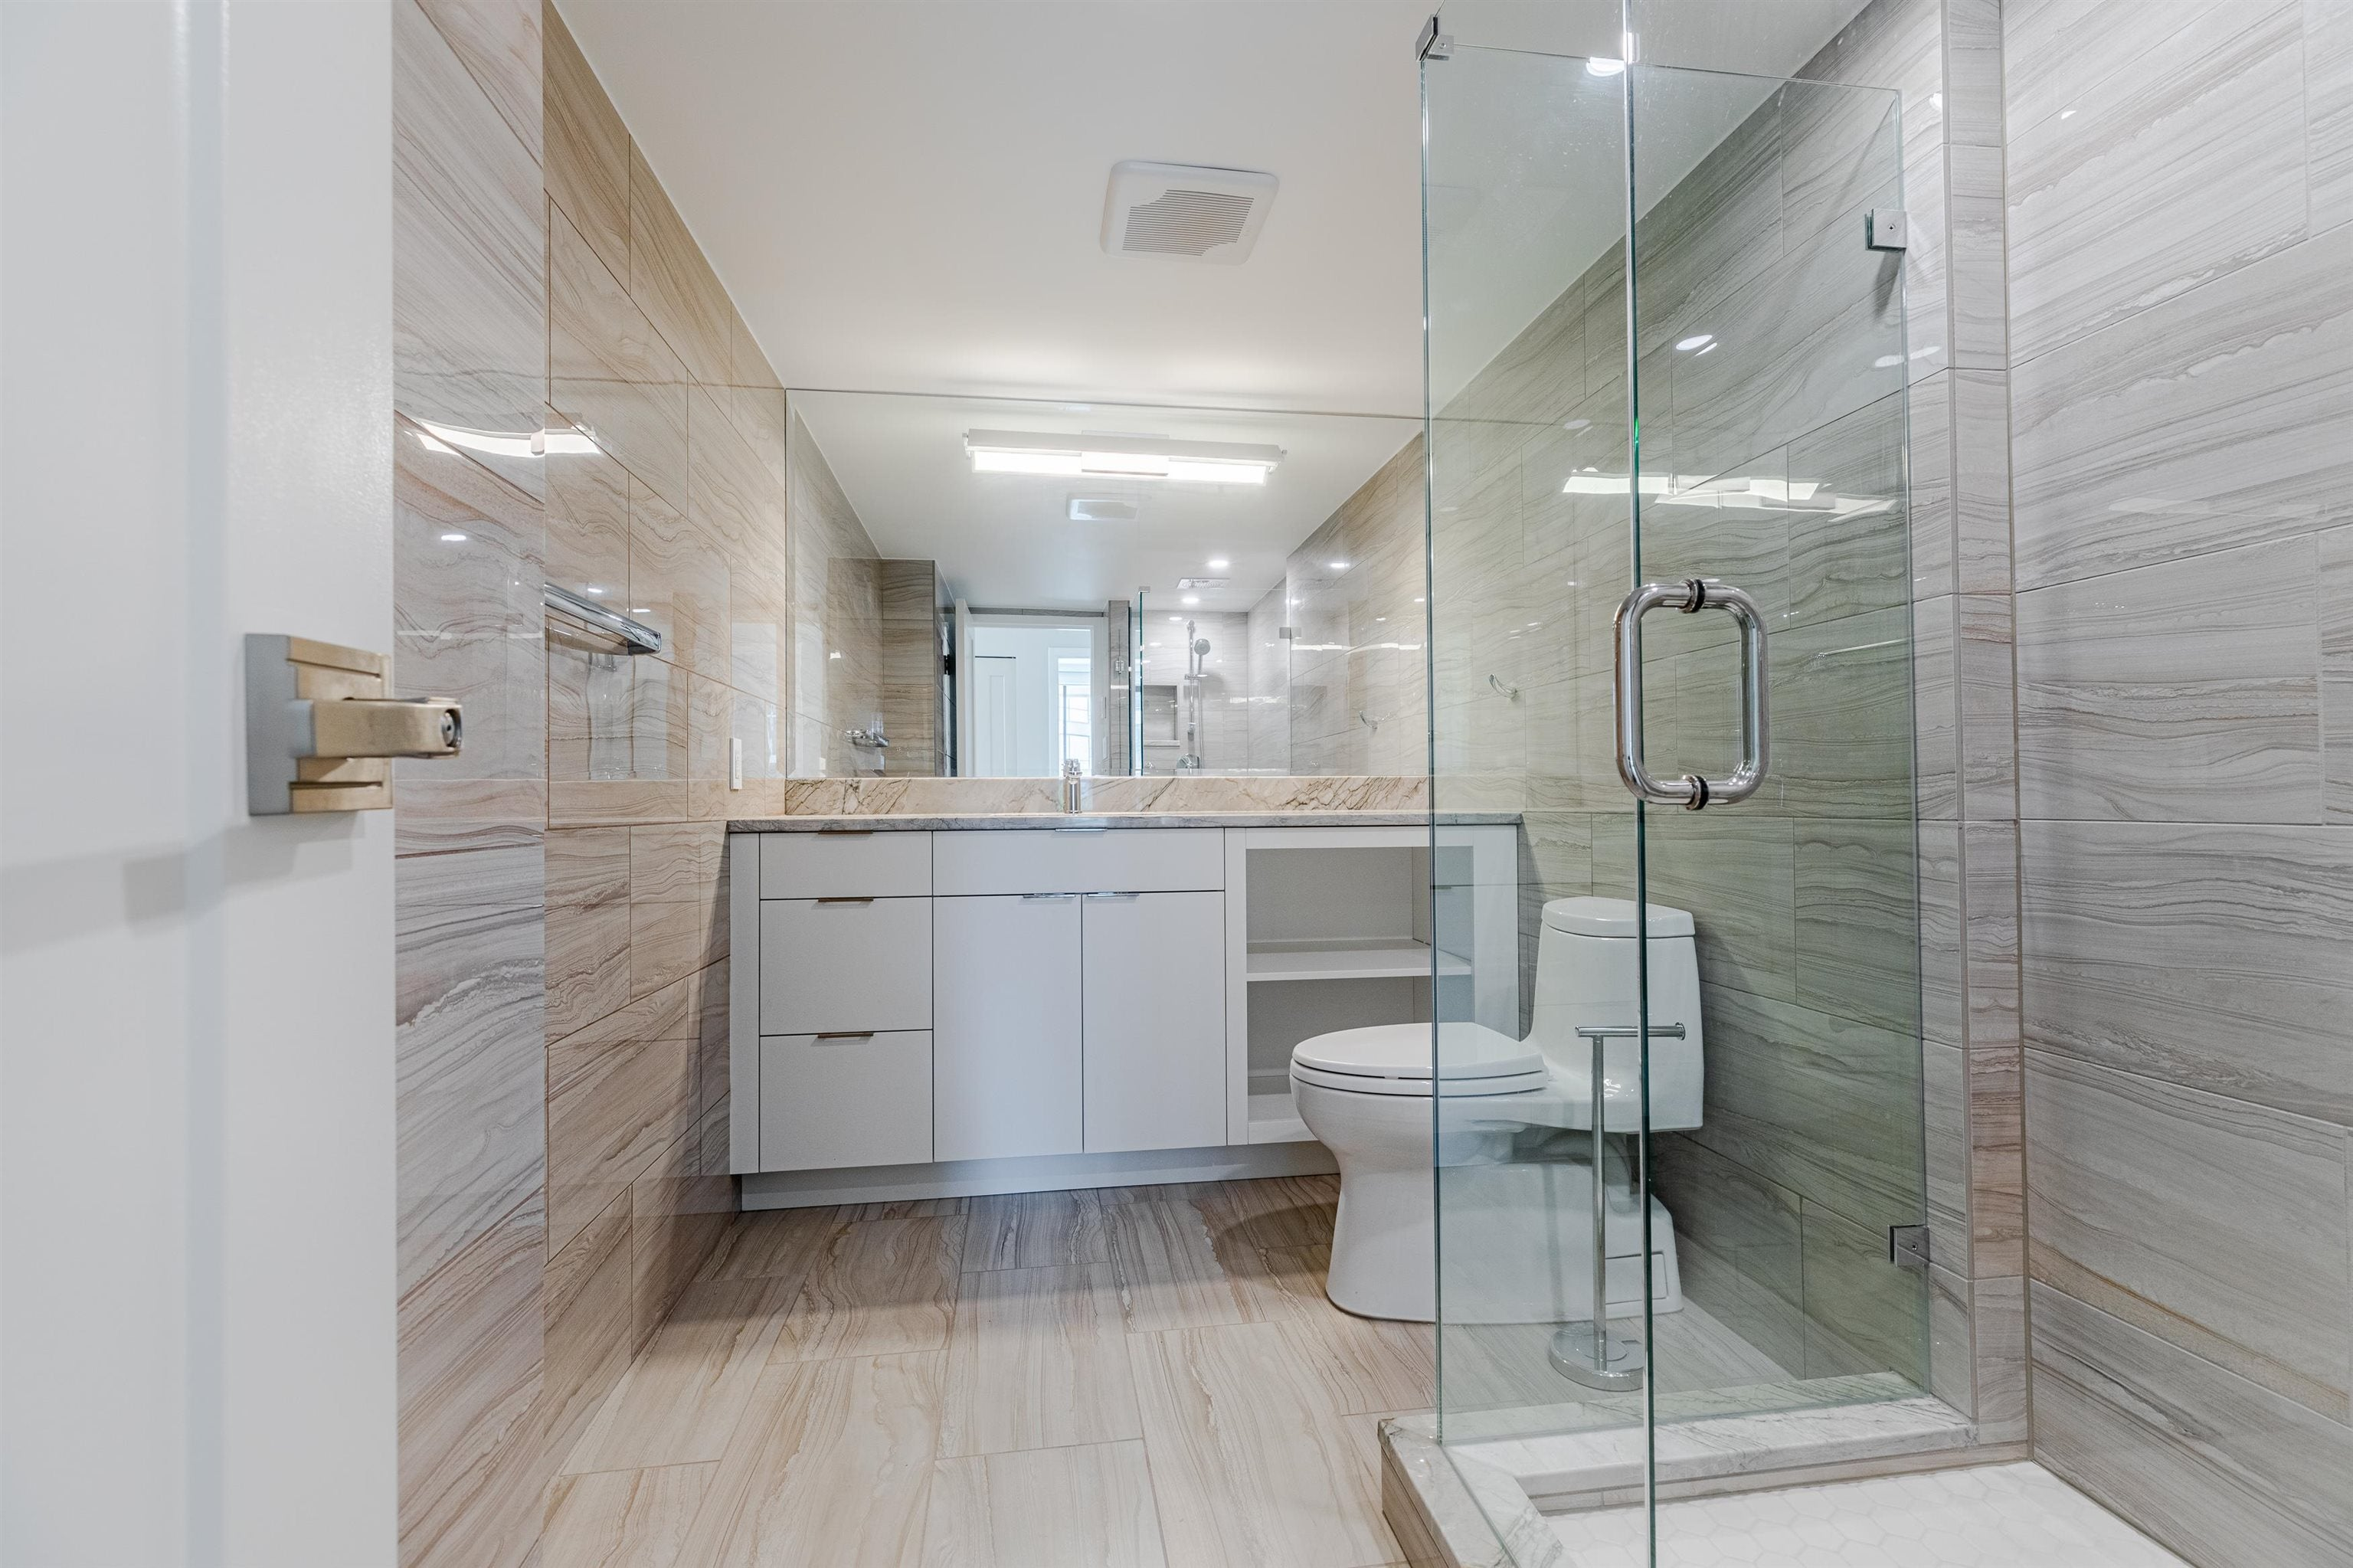 406 1450 PENNYFARTHING DRIVE - False Creek Apartment/Condo for sale, 2 Bedrooms (R2617259) - #16